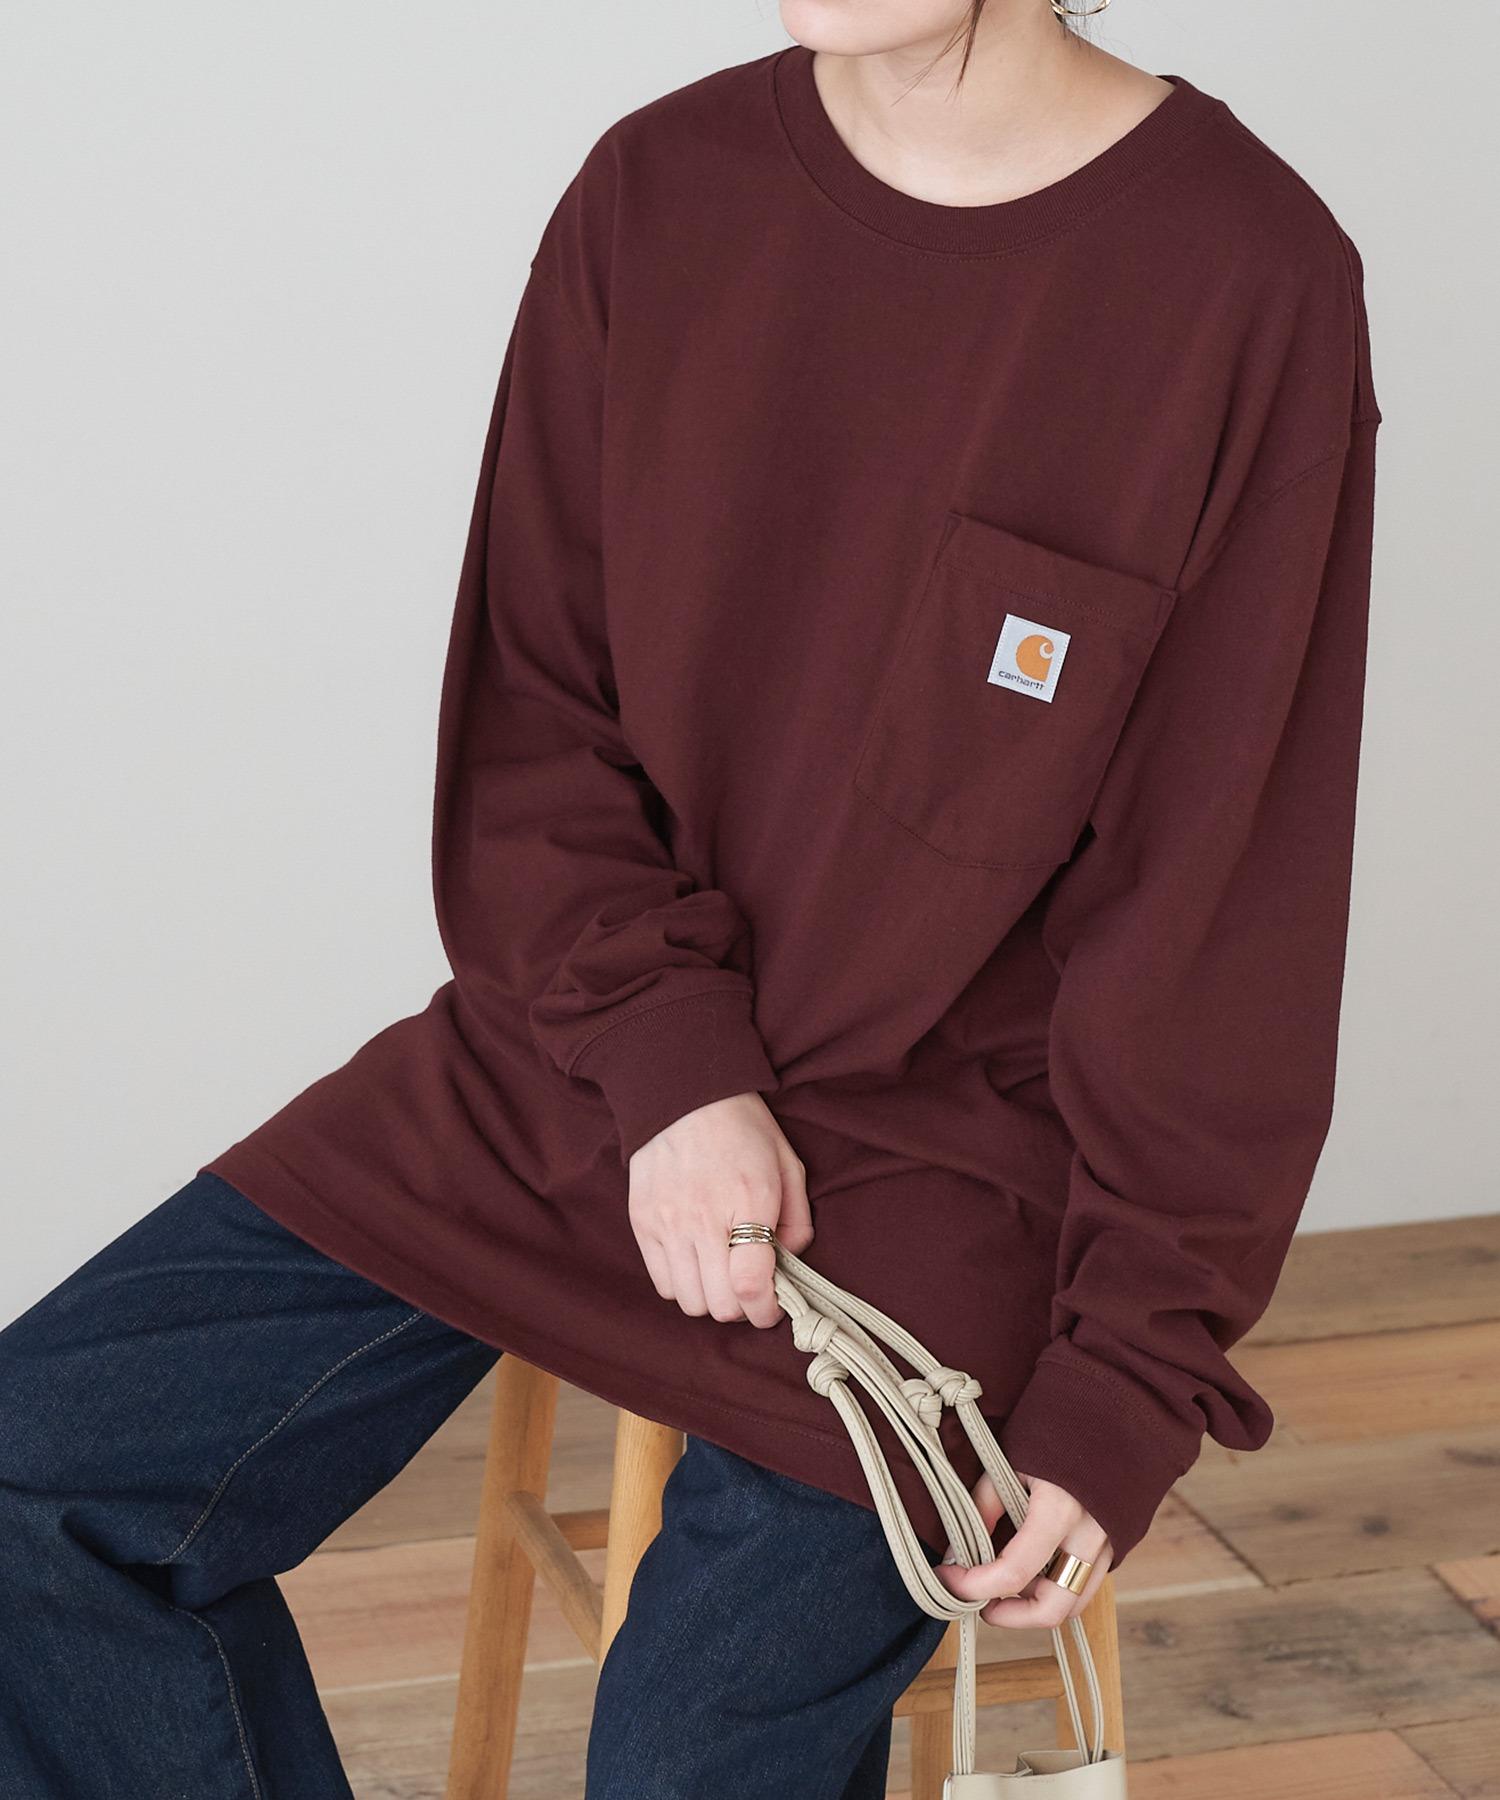 carhartt(カーハート) Workwear Pocket Long-Sleeve T-Shirts ポケットロングTシャツ